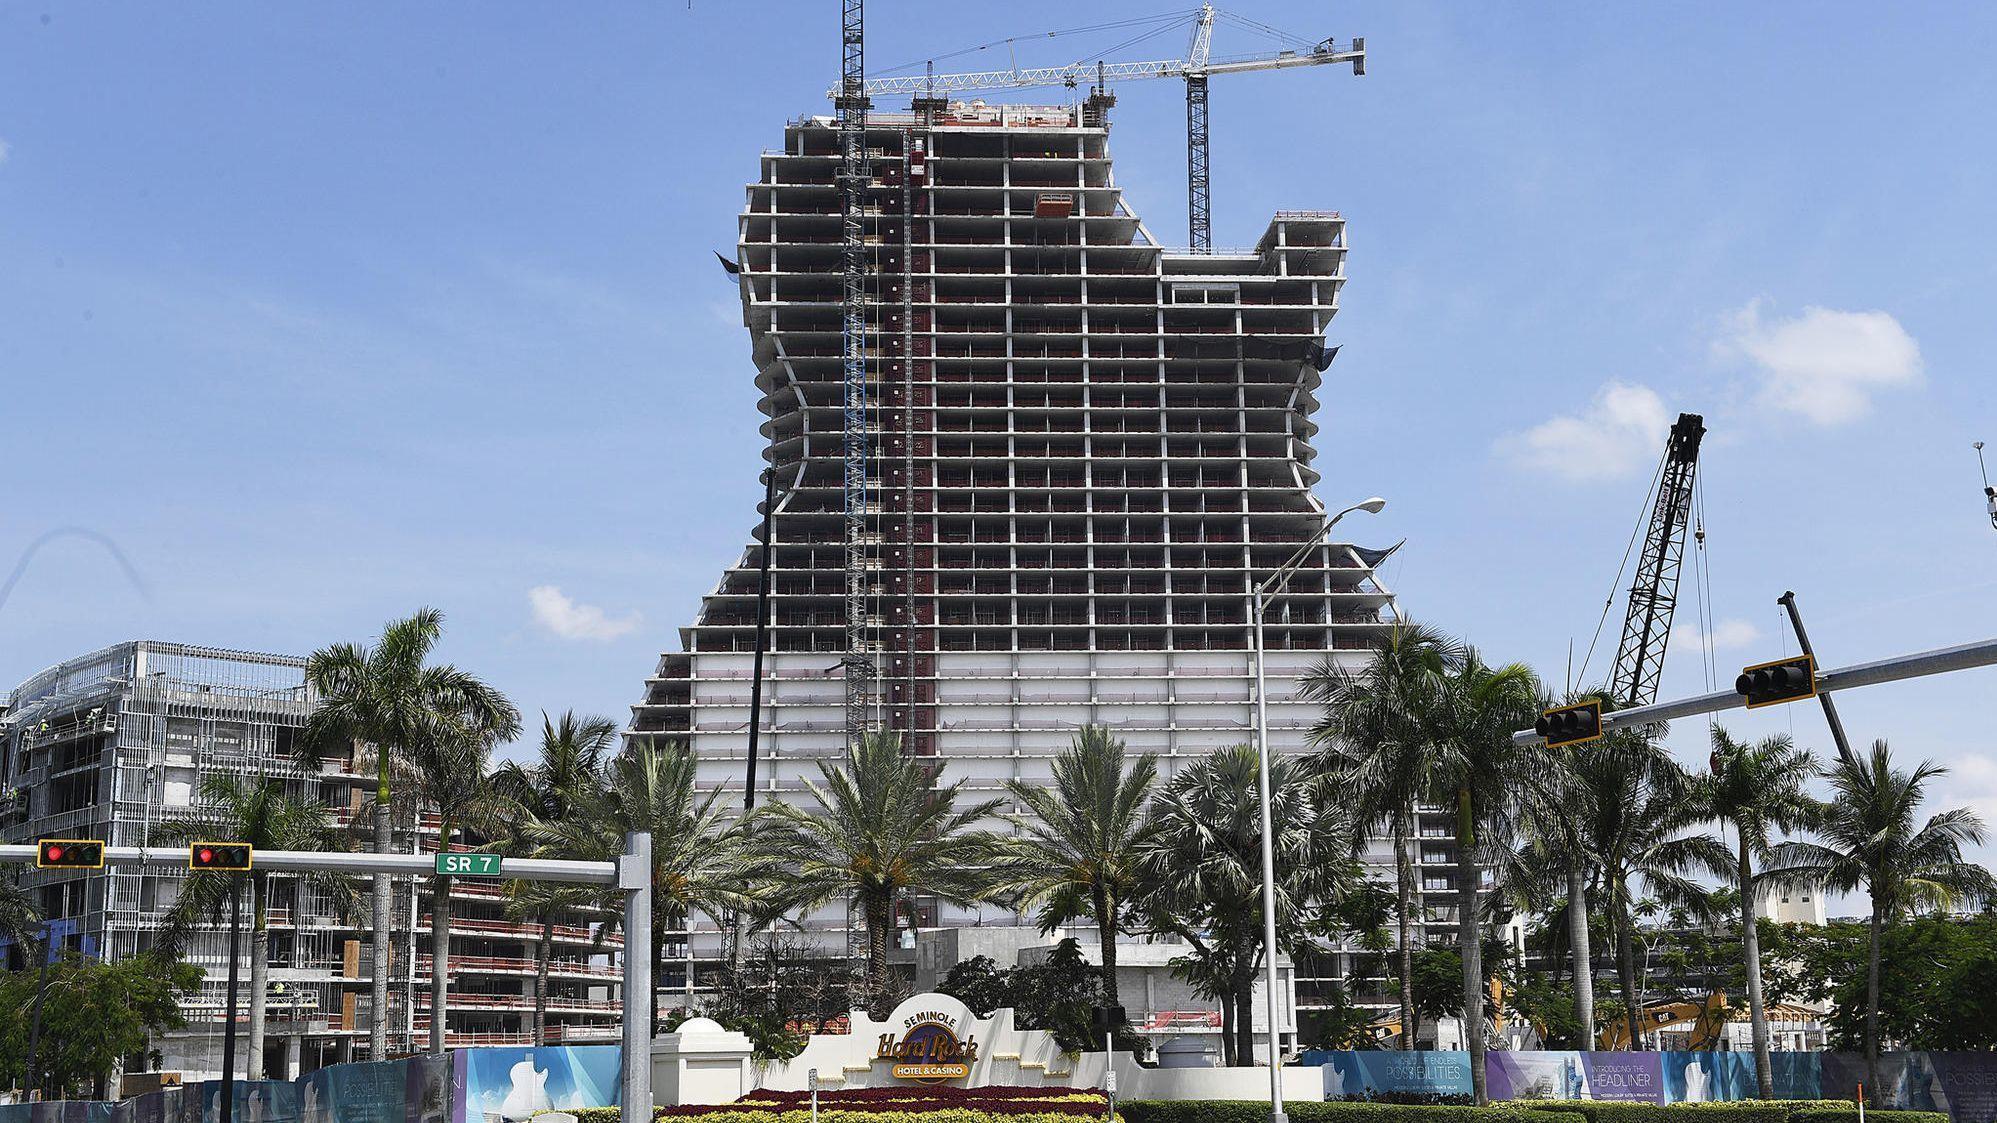 Seminole Hard Rock Hotel Fort Lauderdale Florida